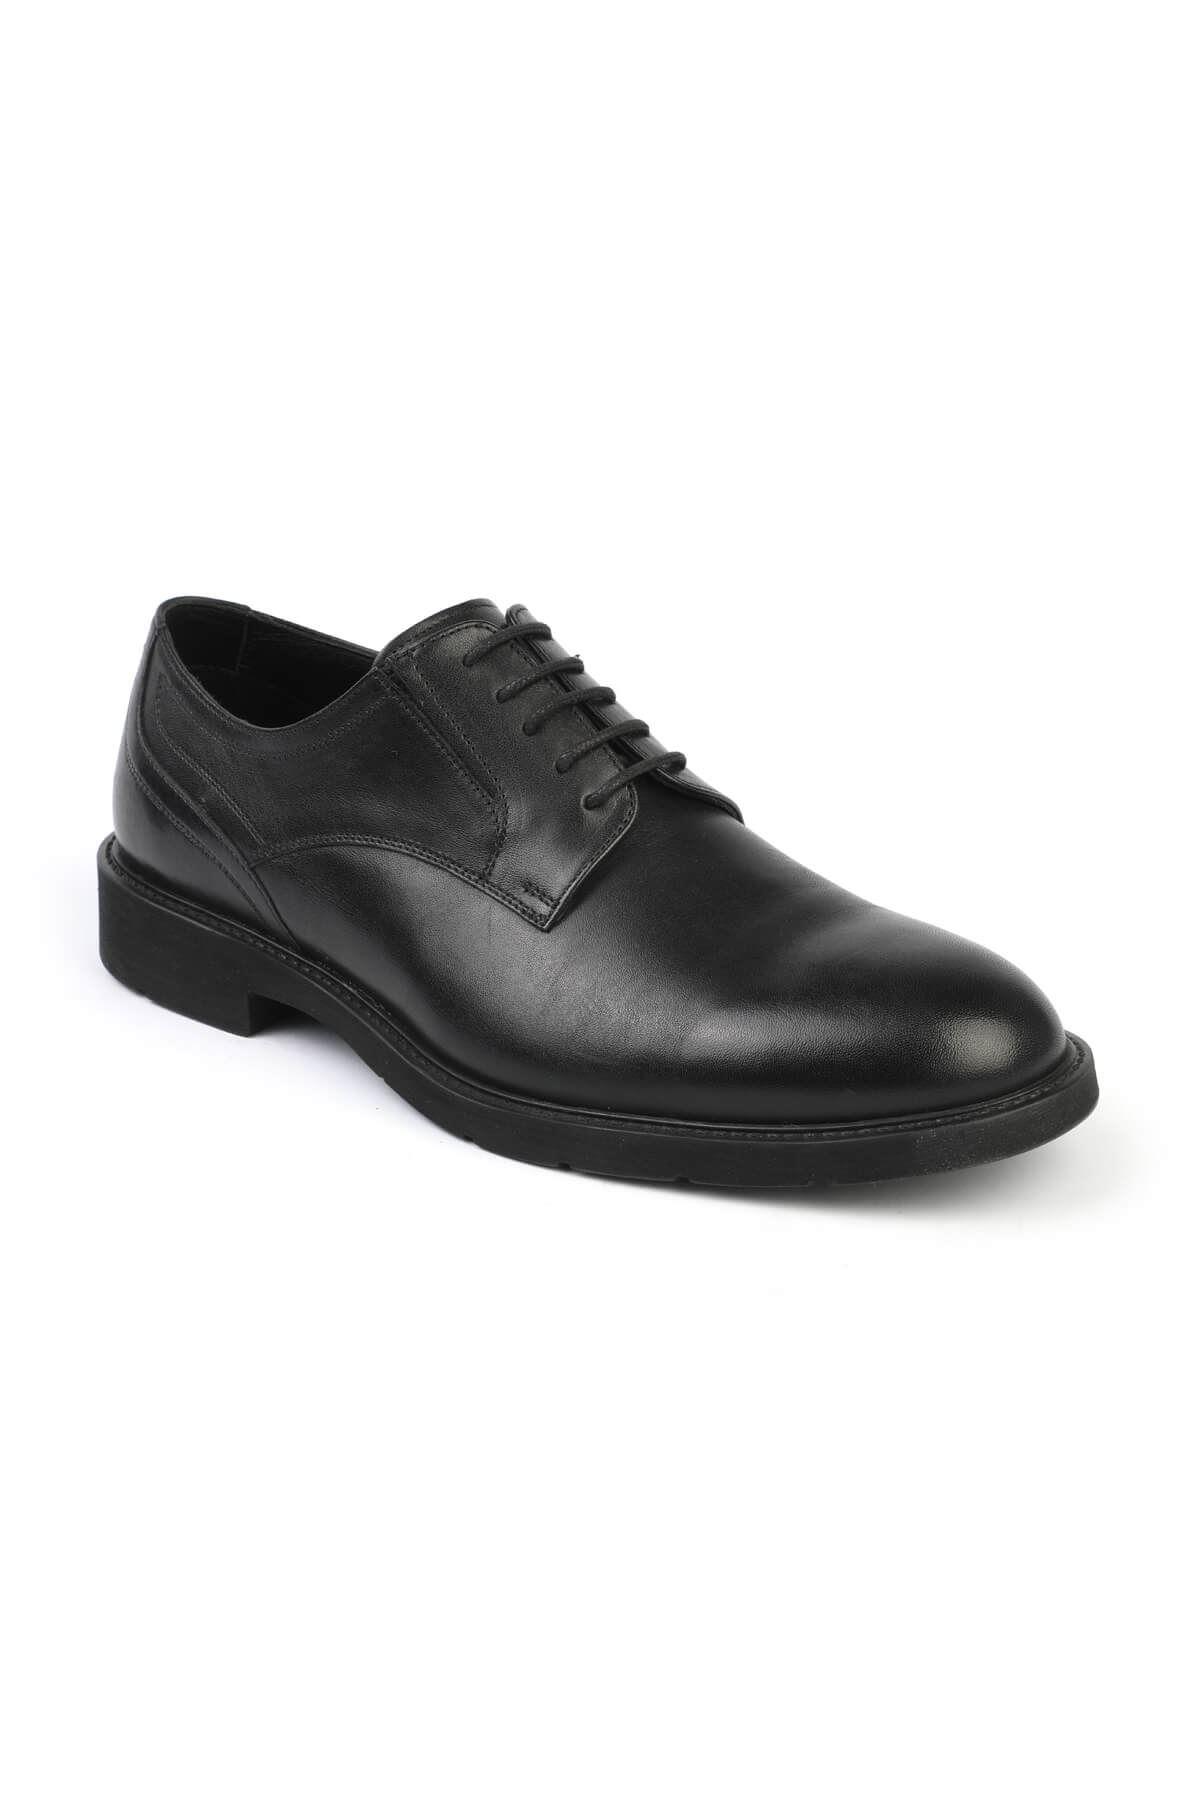 Libero 2922 Black Casual Shoes